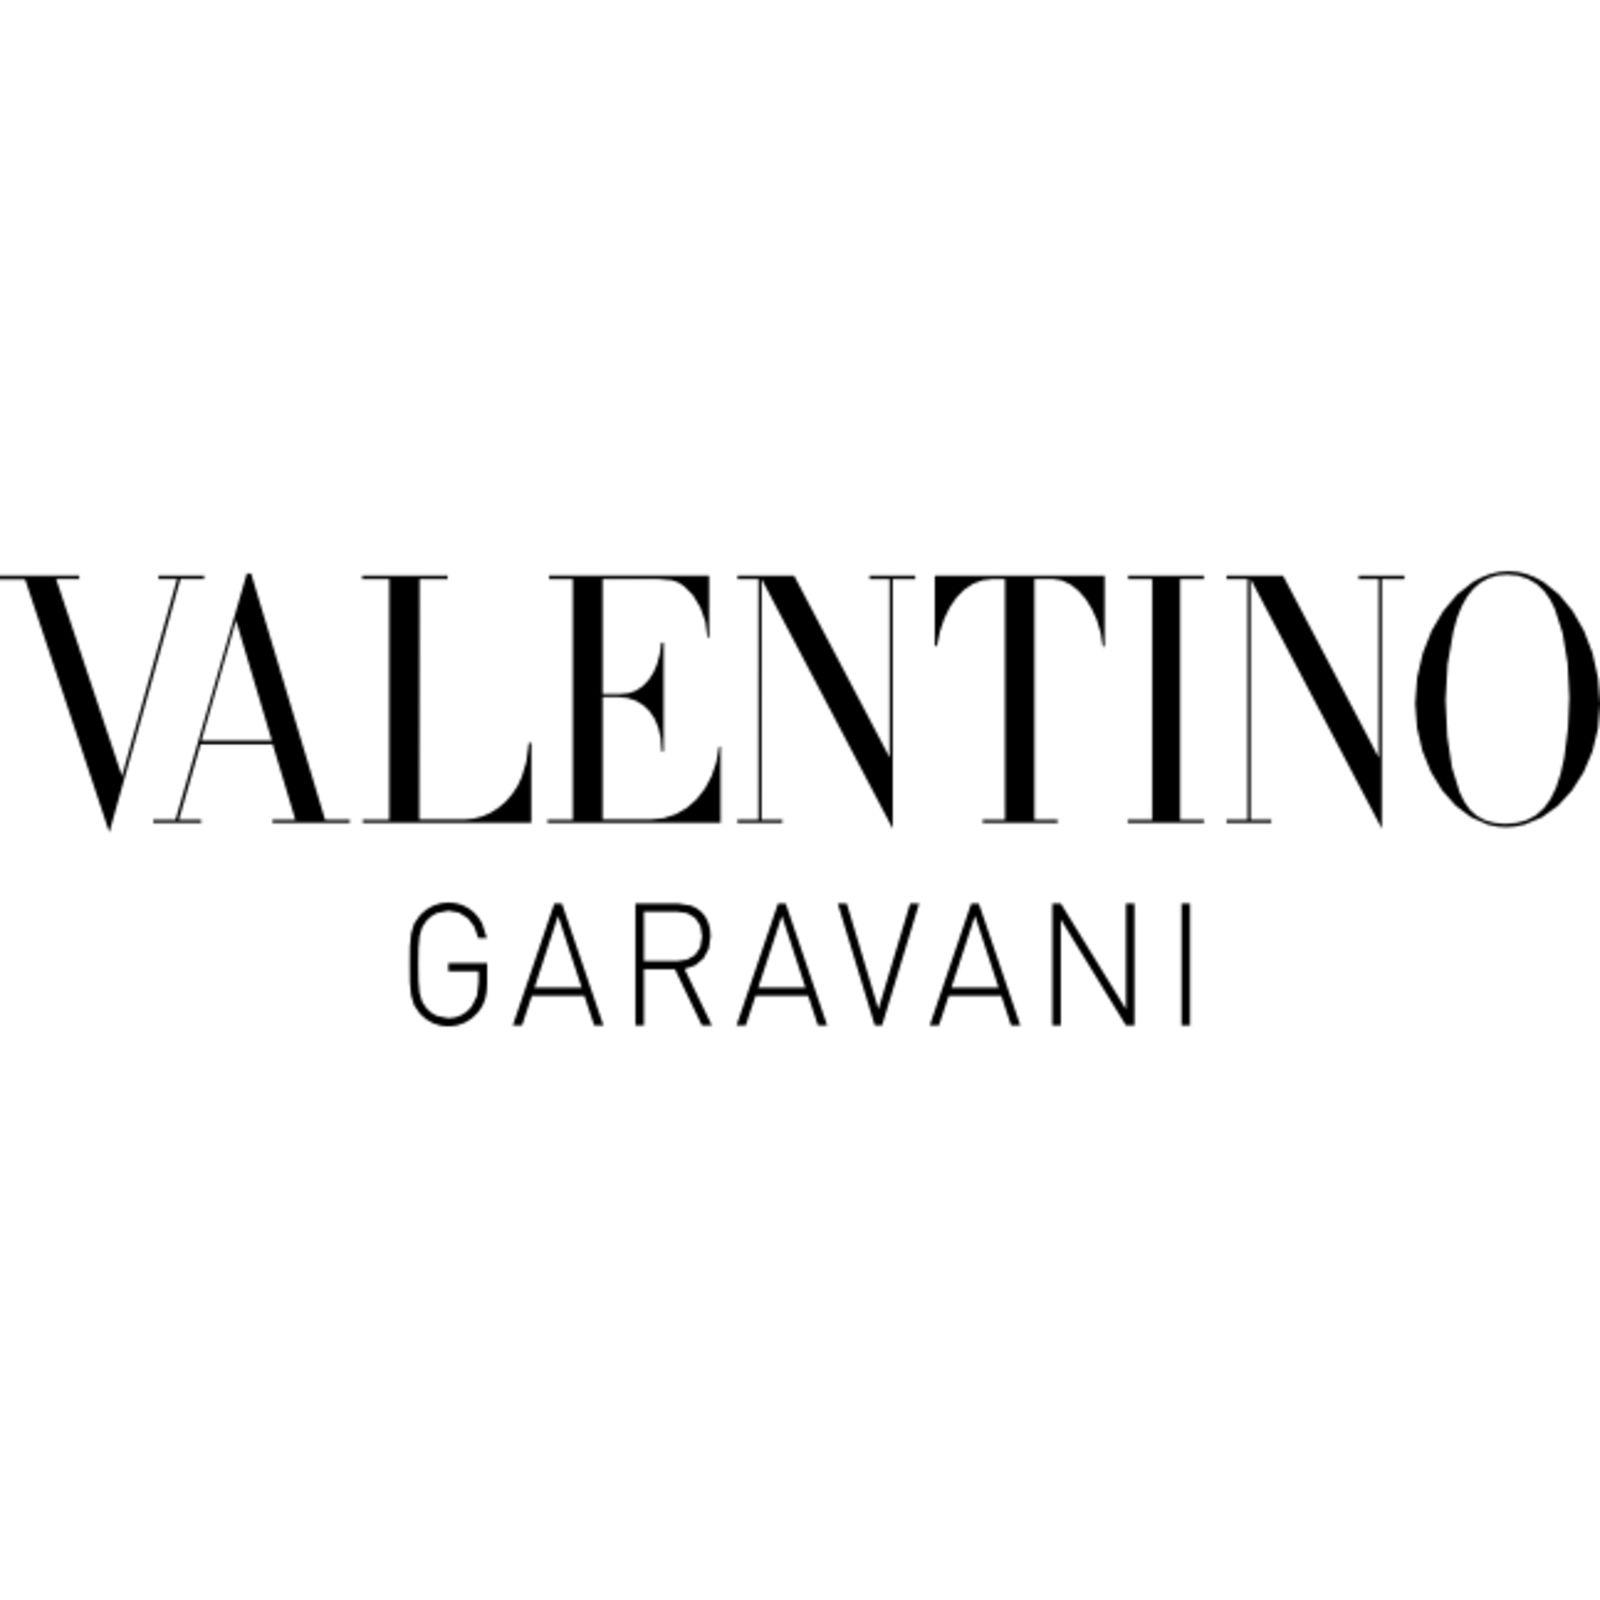 VALENTINO GARAVANI (Image 1)